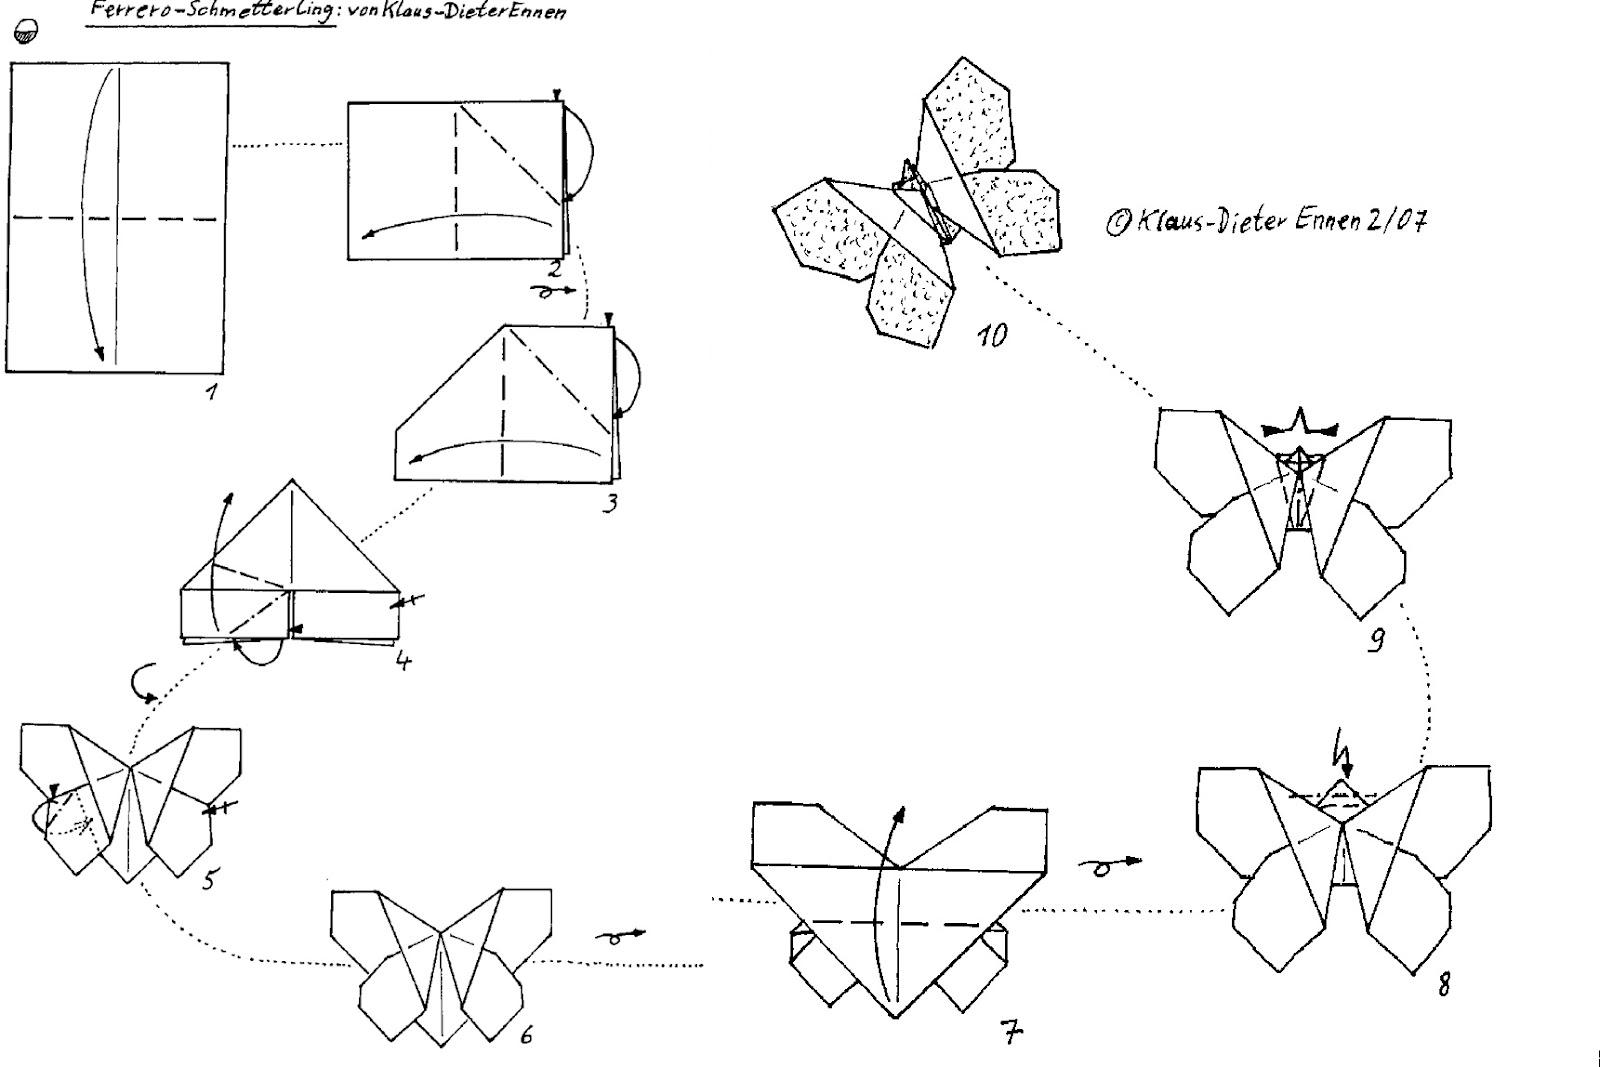 pin origami diagram flowers  u00c3 u0192 u00c6 u2019 u00c3 u2020 u00e2 u20ac u2122 u00c3 u0192 u00e2 u20ac  u00c3 u00a2 u00e2 u201a u00ac u00e2 u201e u00a2 u00c3 u0192 u00c6 u2019 u00c3 u201a u00c2